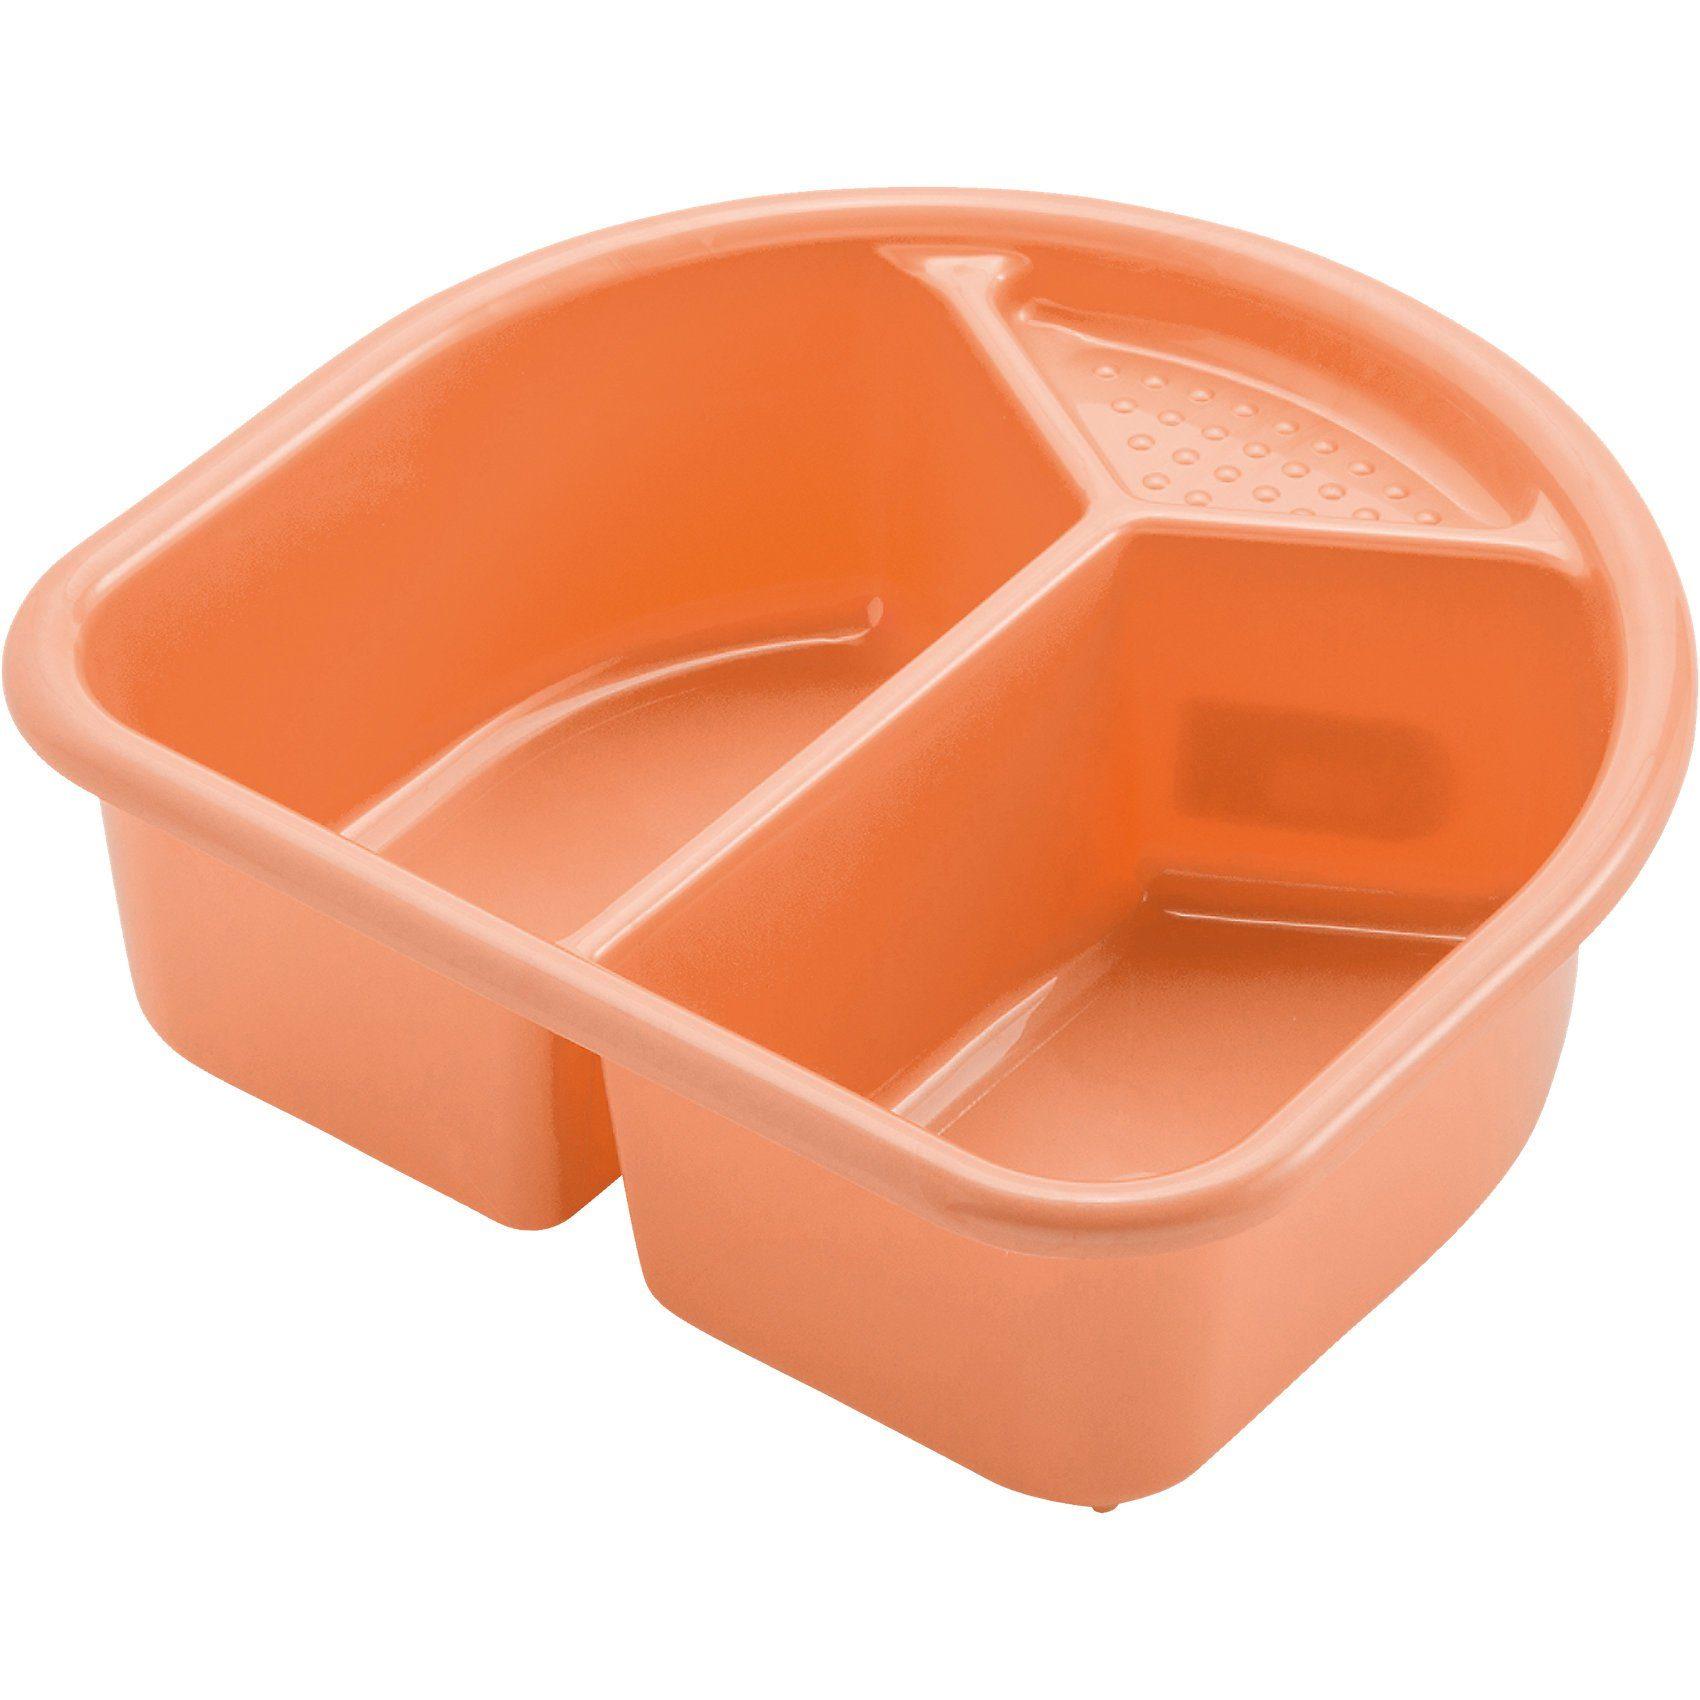 Rotho Babydesign Waschschüssel Top, peach